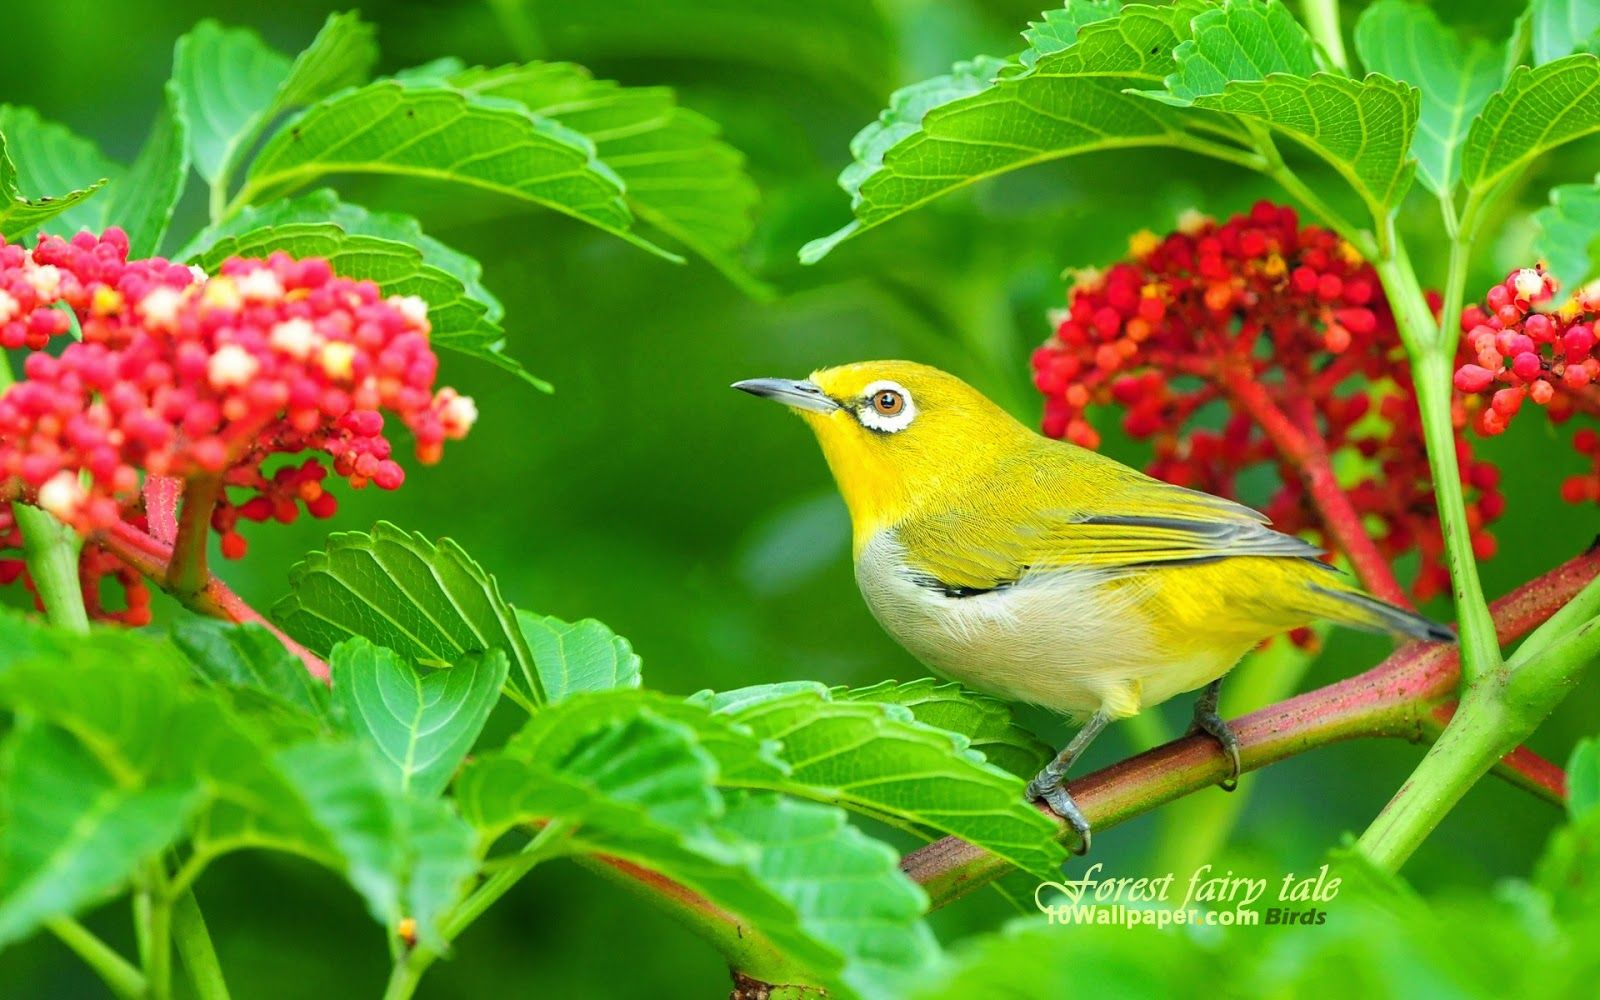 Amazing Wallpaper High Quality Bird - 836c28846238fbc3cddd2a94b58b6922  Photograph_36760.jpg